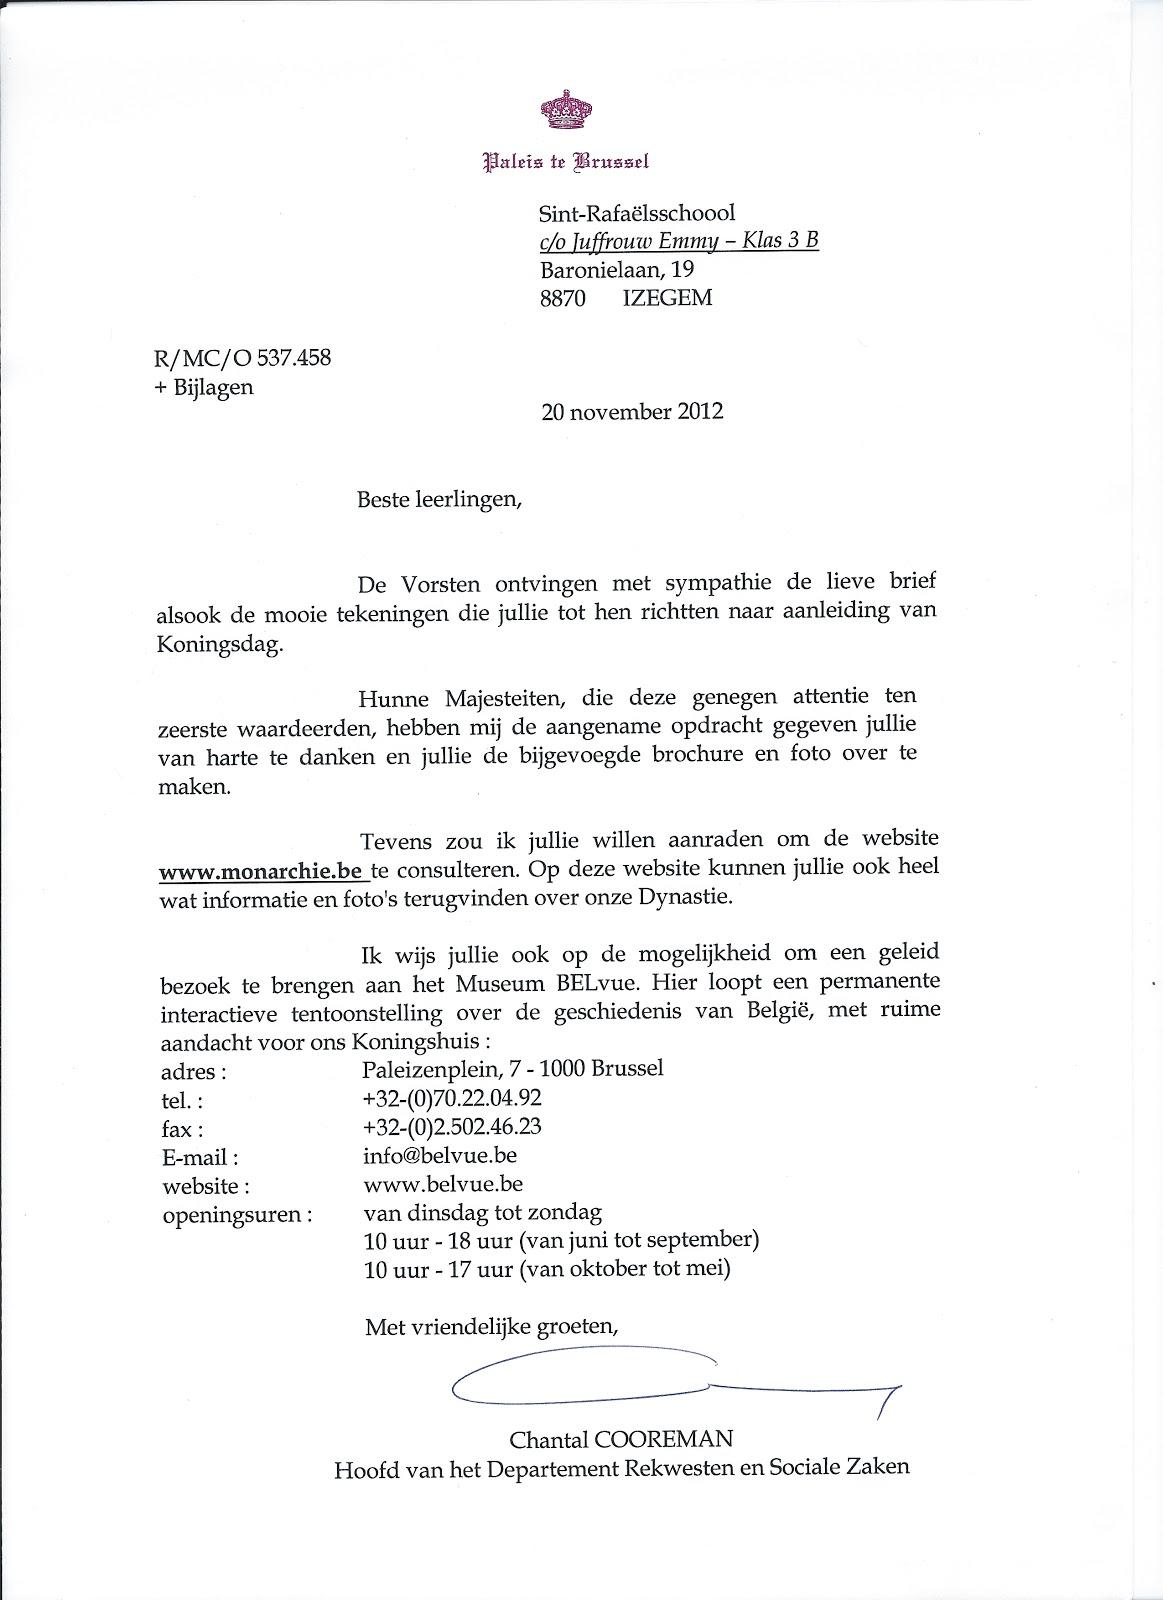 klas 3b blogt!: Koninklijke post